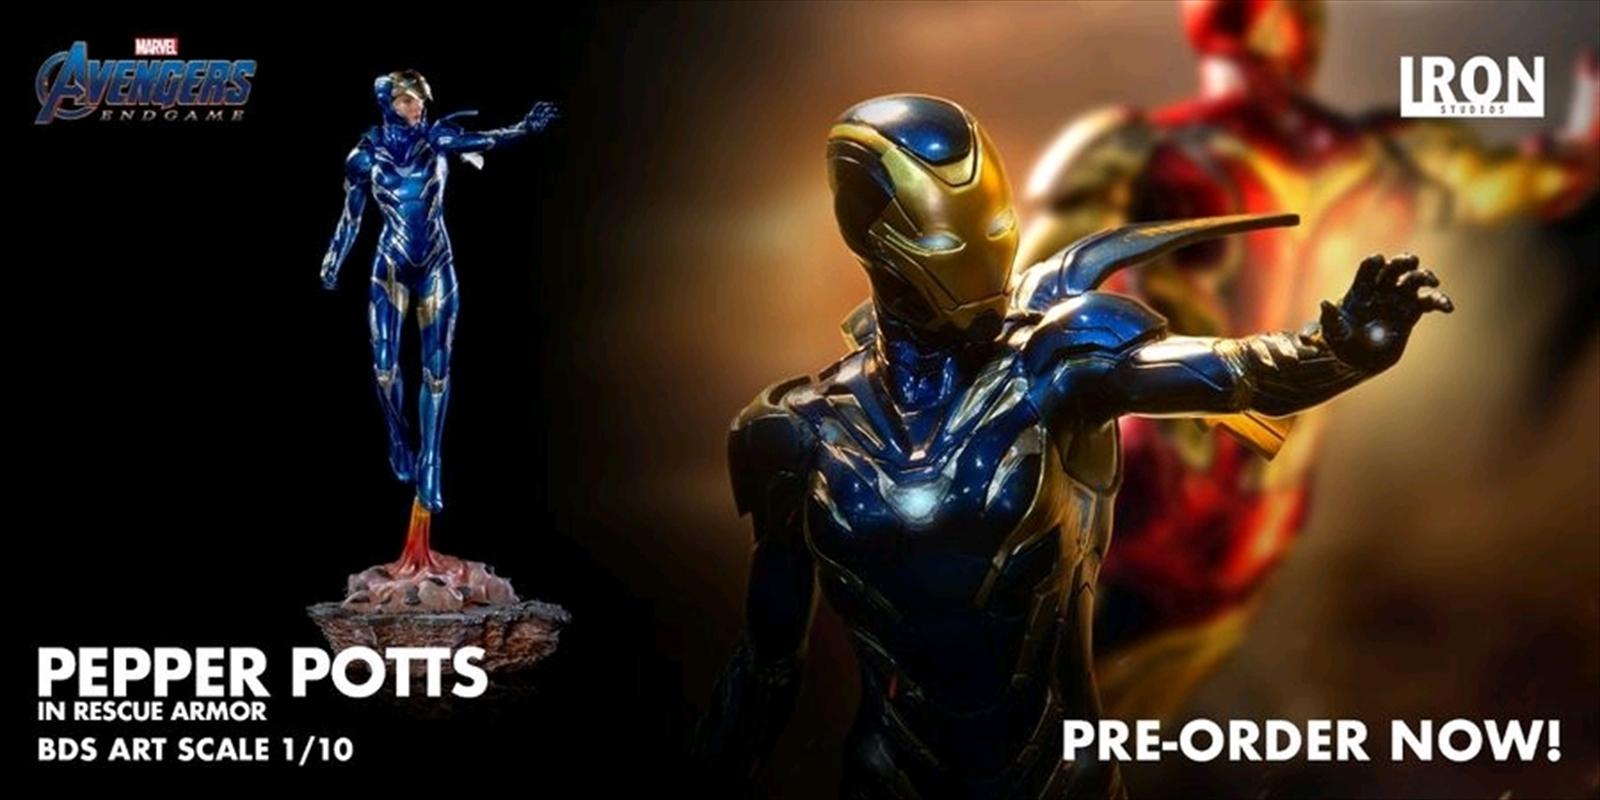 Avengers 4: Endgame - Pepper Potts in Rescue Armor 1:10 Scale Statue | Merchandise